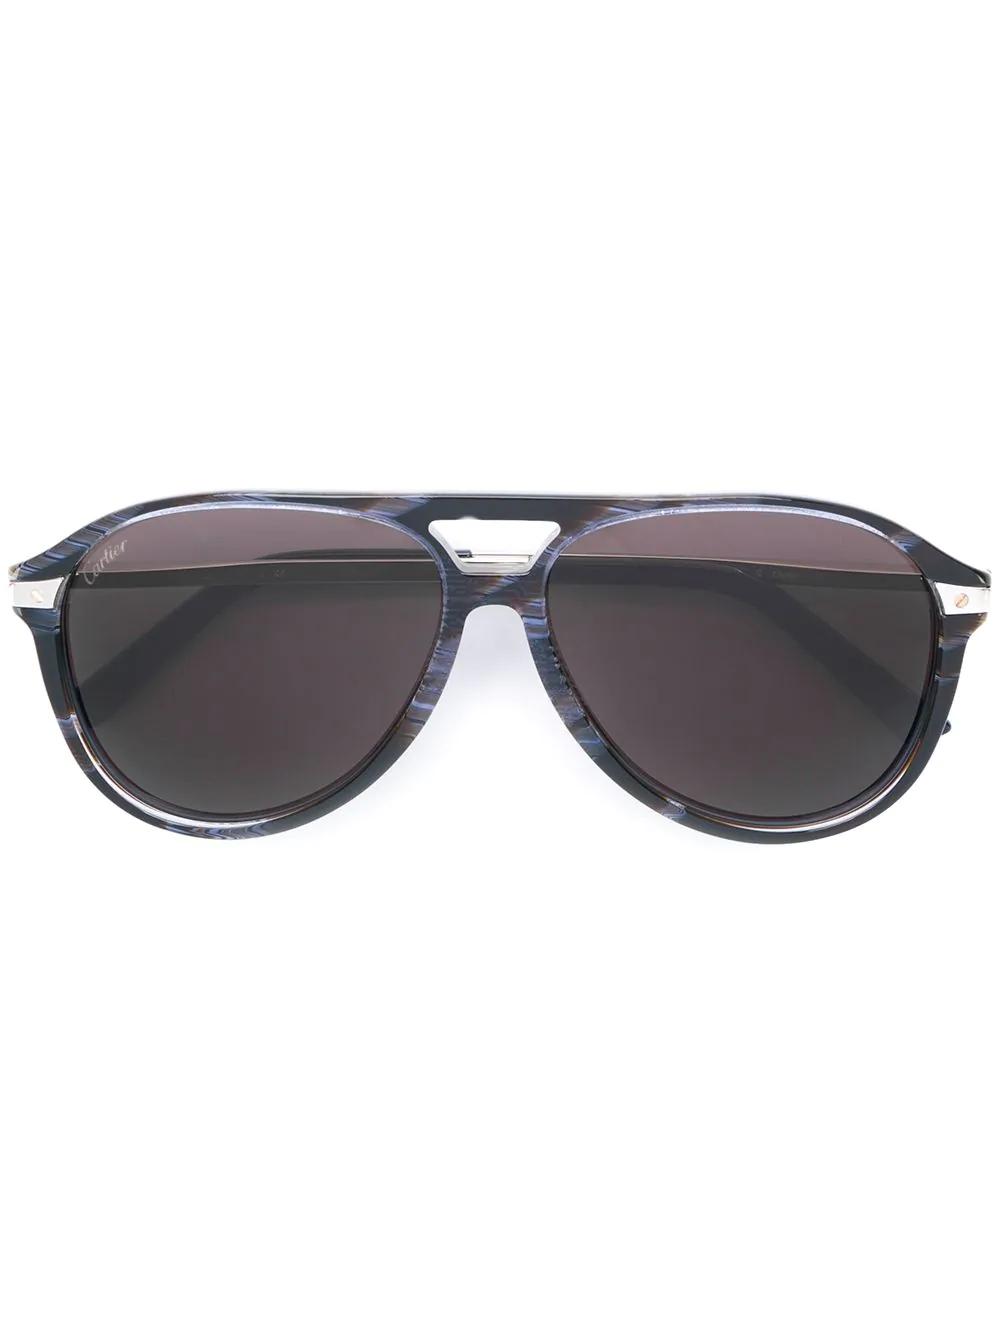 d32eac7283ce7 Cartier Santos De Sunglasses - Blue